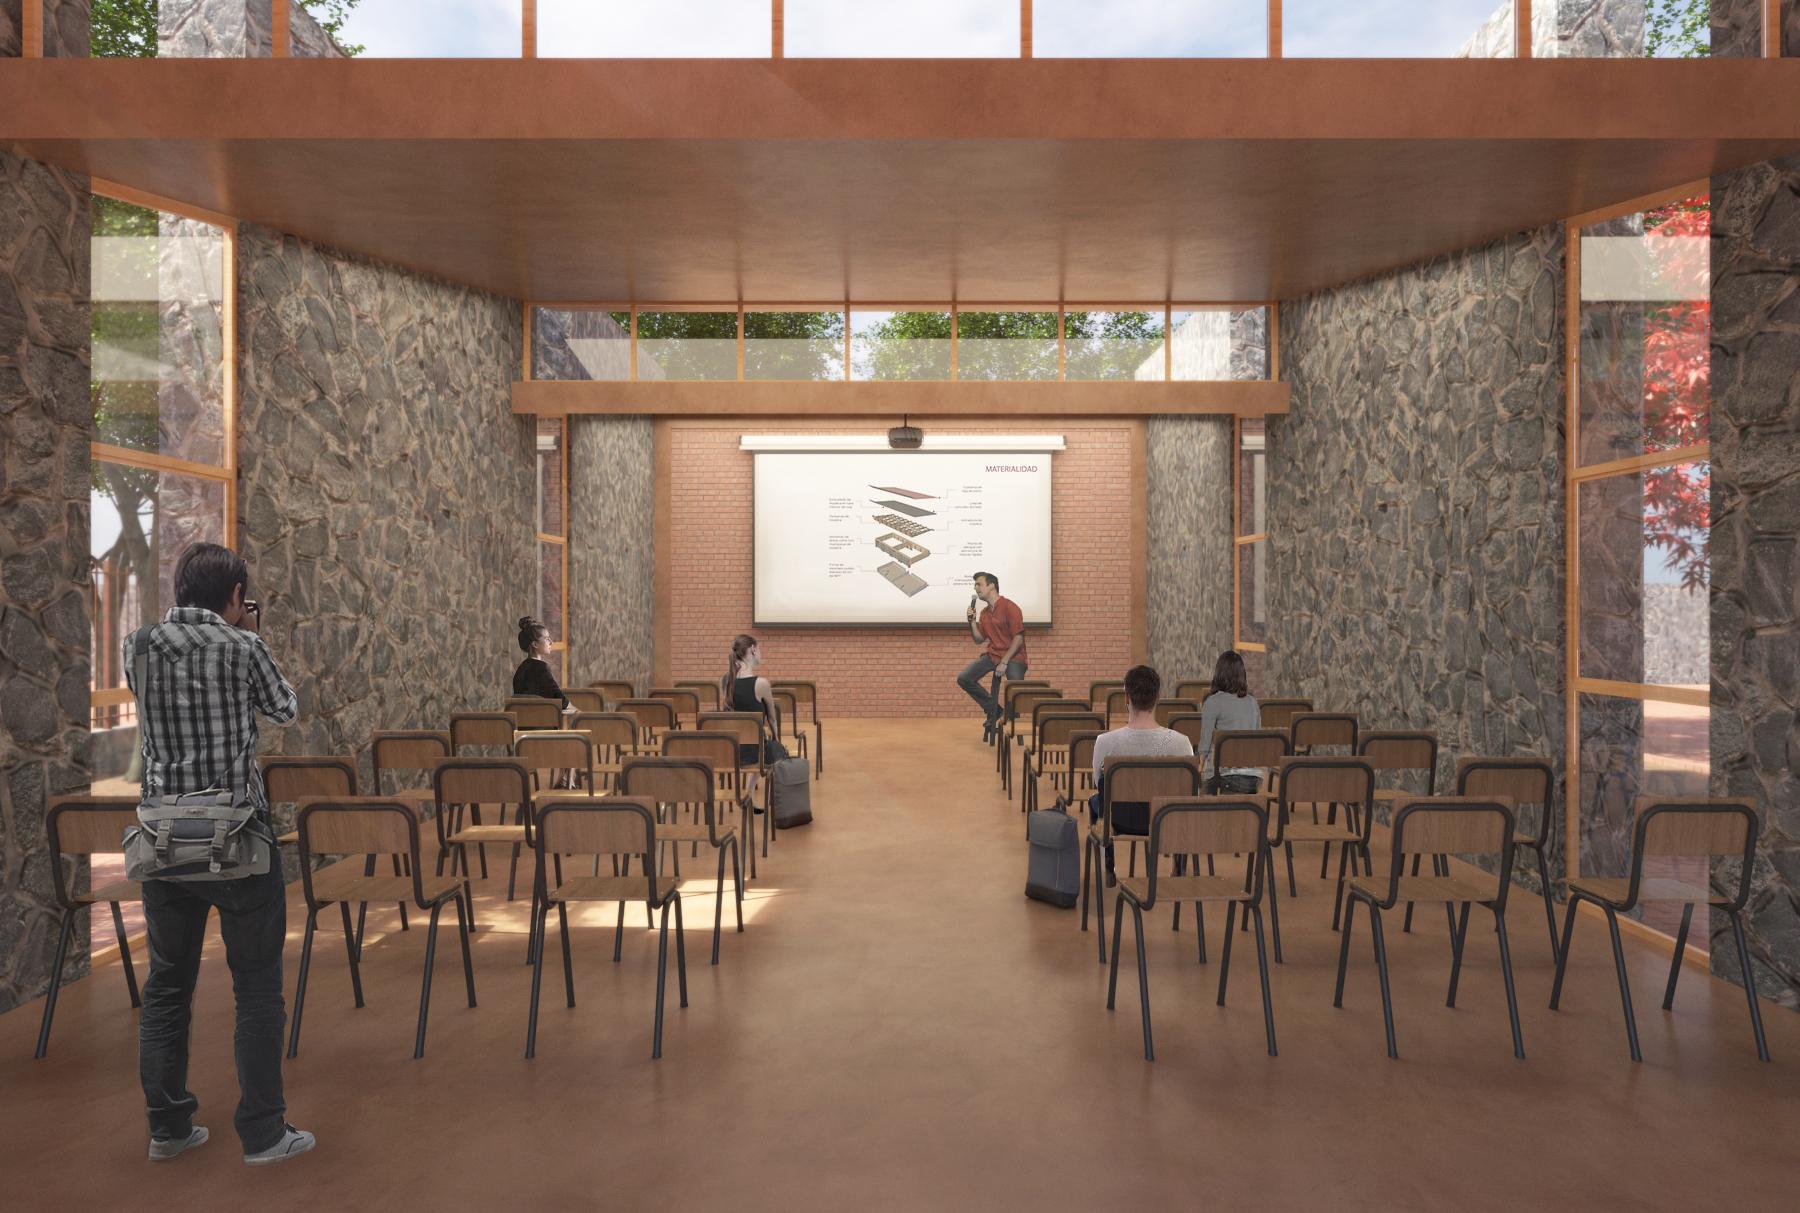 Interior-auditorio-editado.jpg